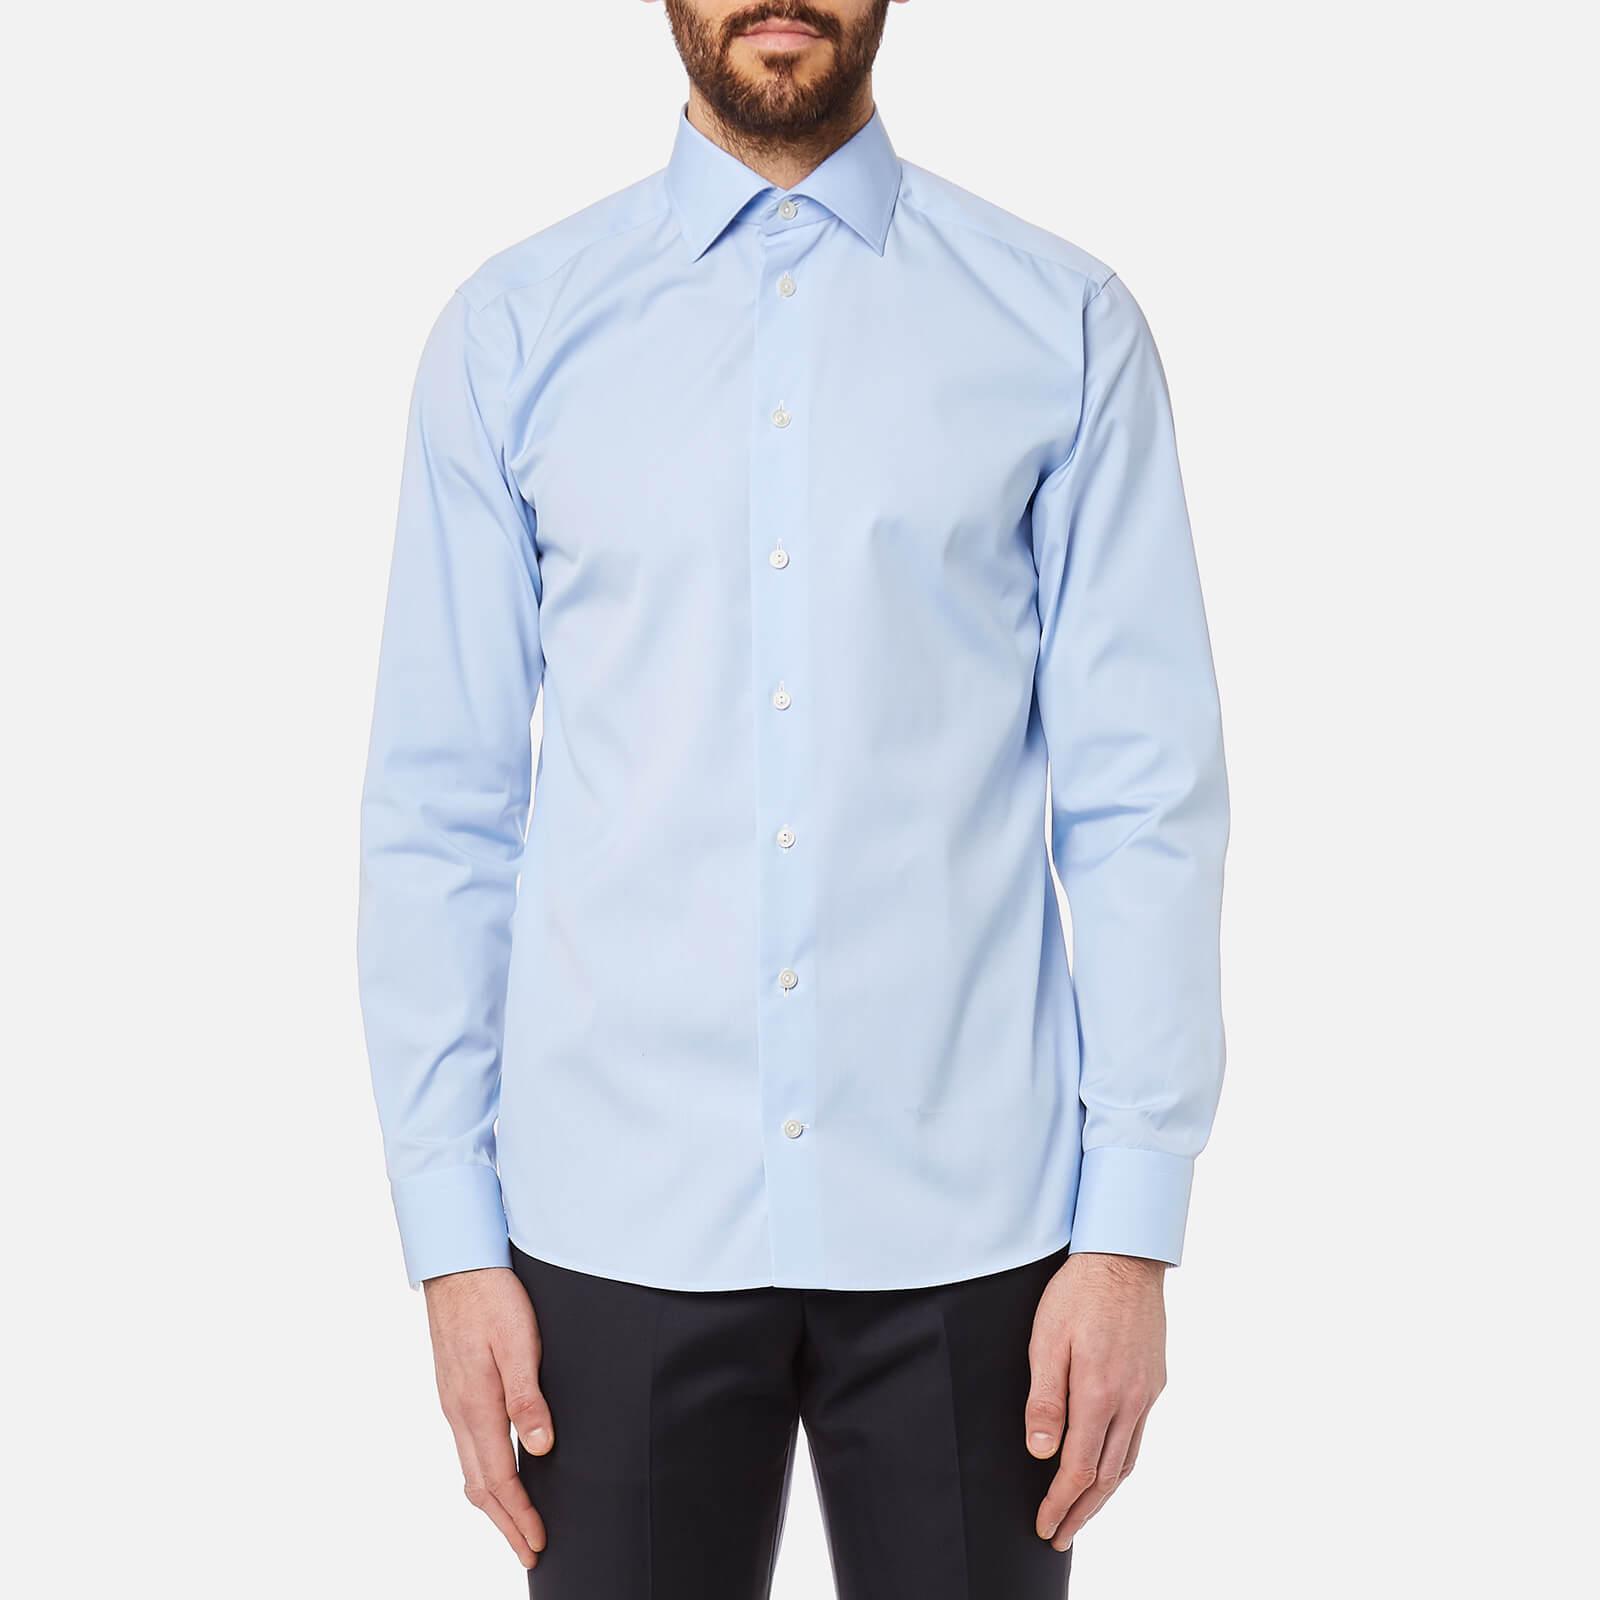 dfc9ab15a7 Eton Shirts Coupon Code - Nils Stucki Kieferorthopäde